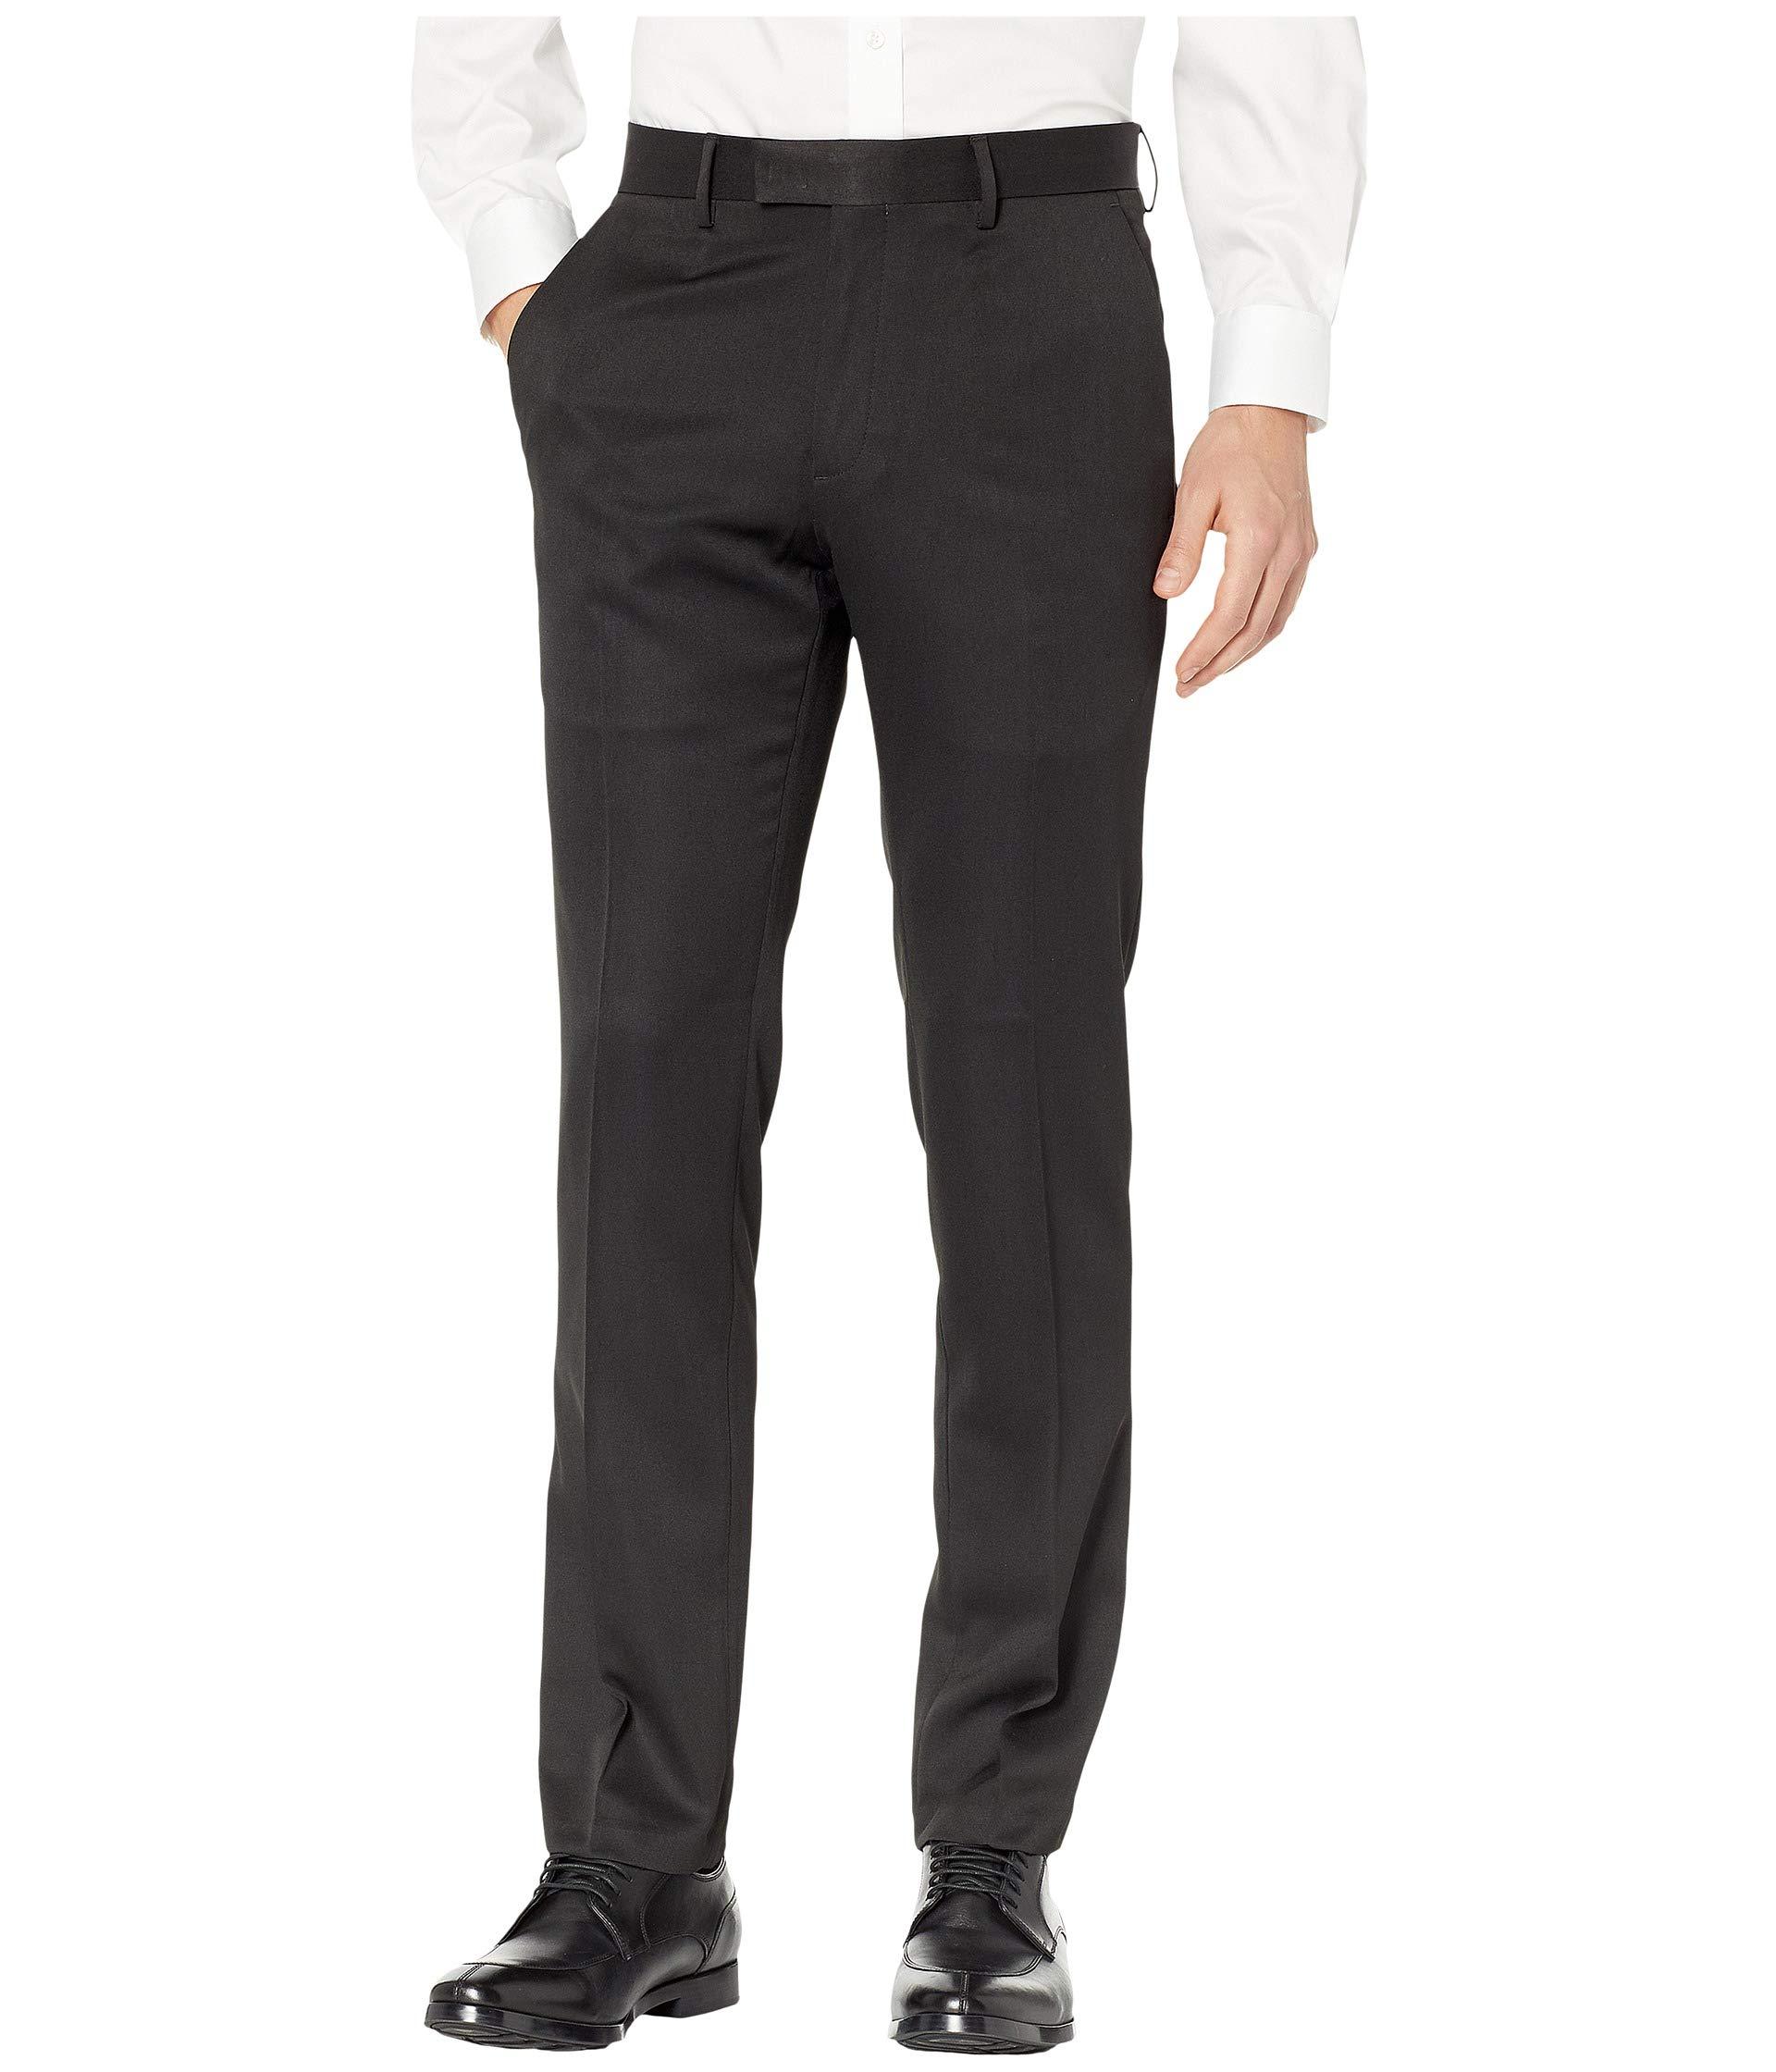 Kenneth Cole REACTION Men's Urban Heather Slim Fit Flat Front Dress Pant, Black, 28x30